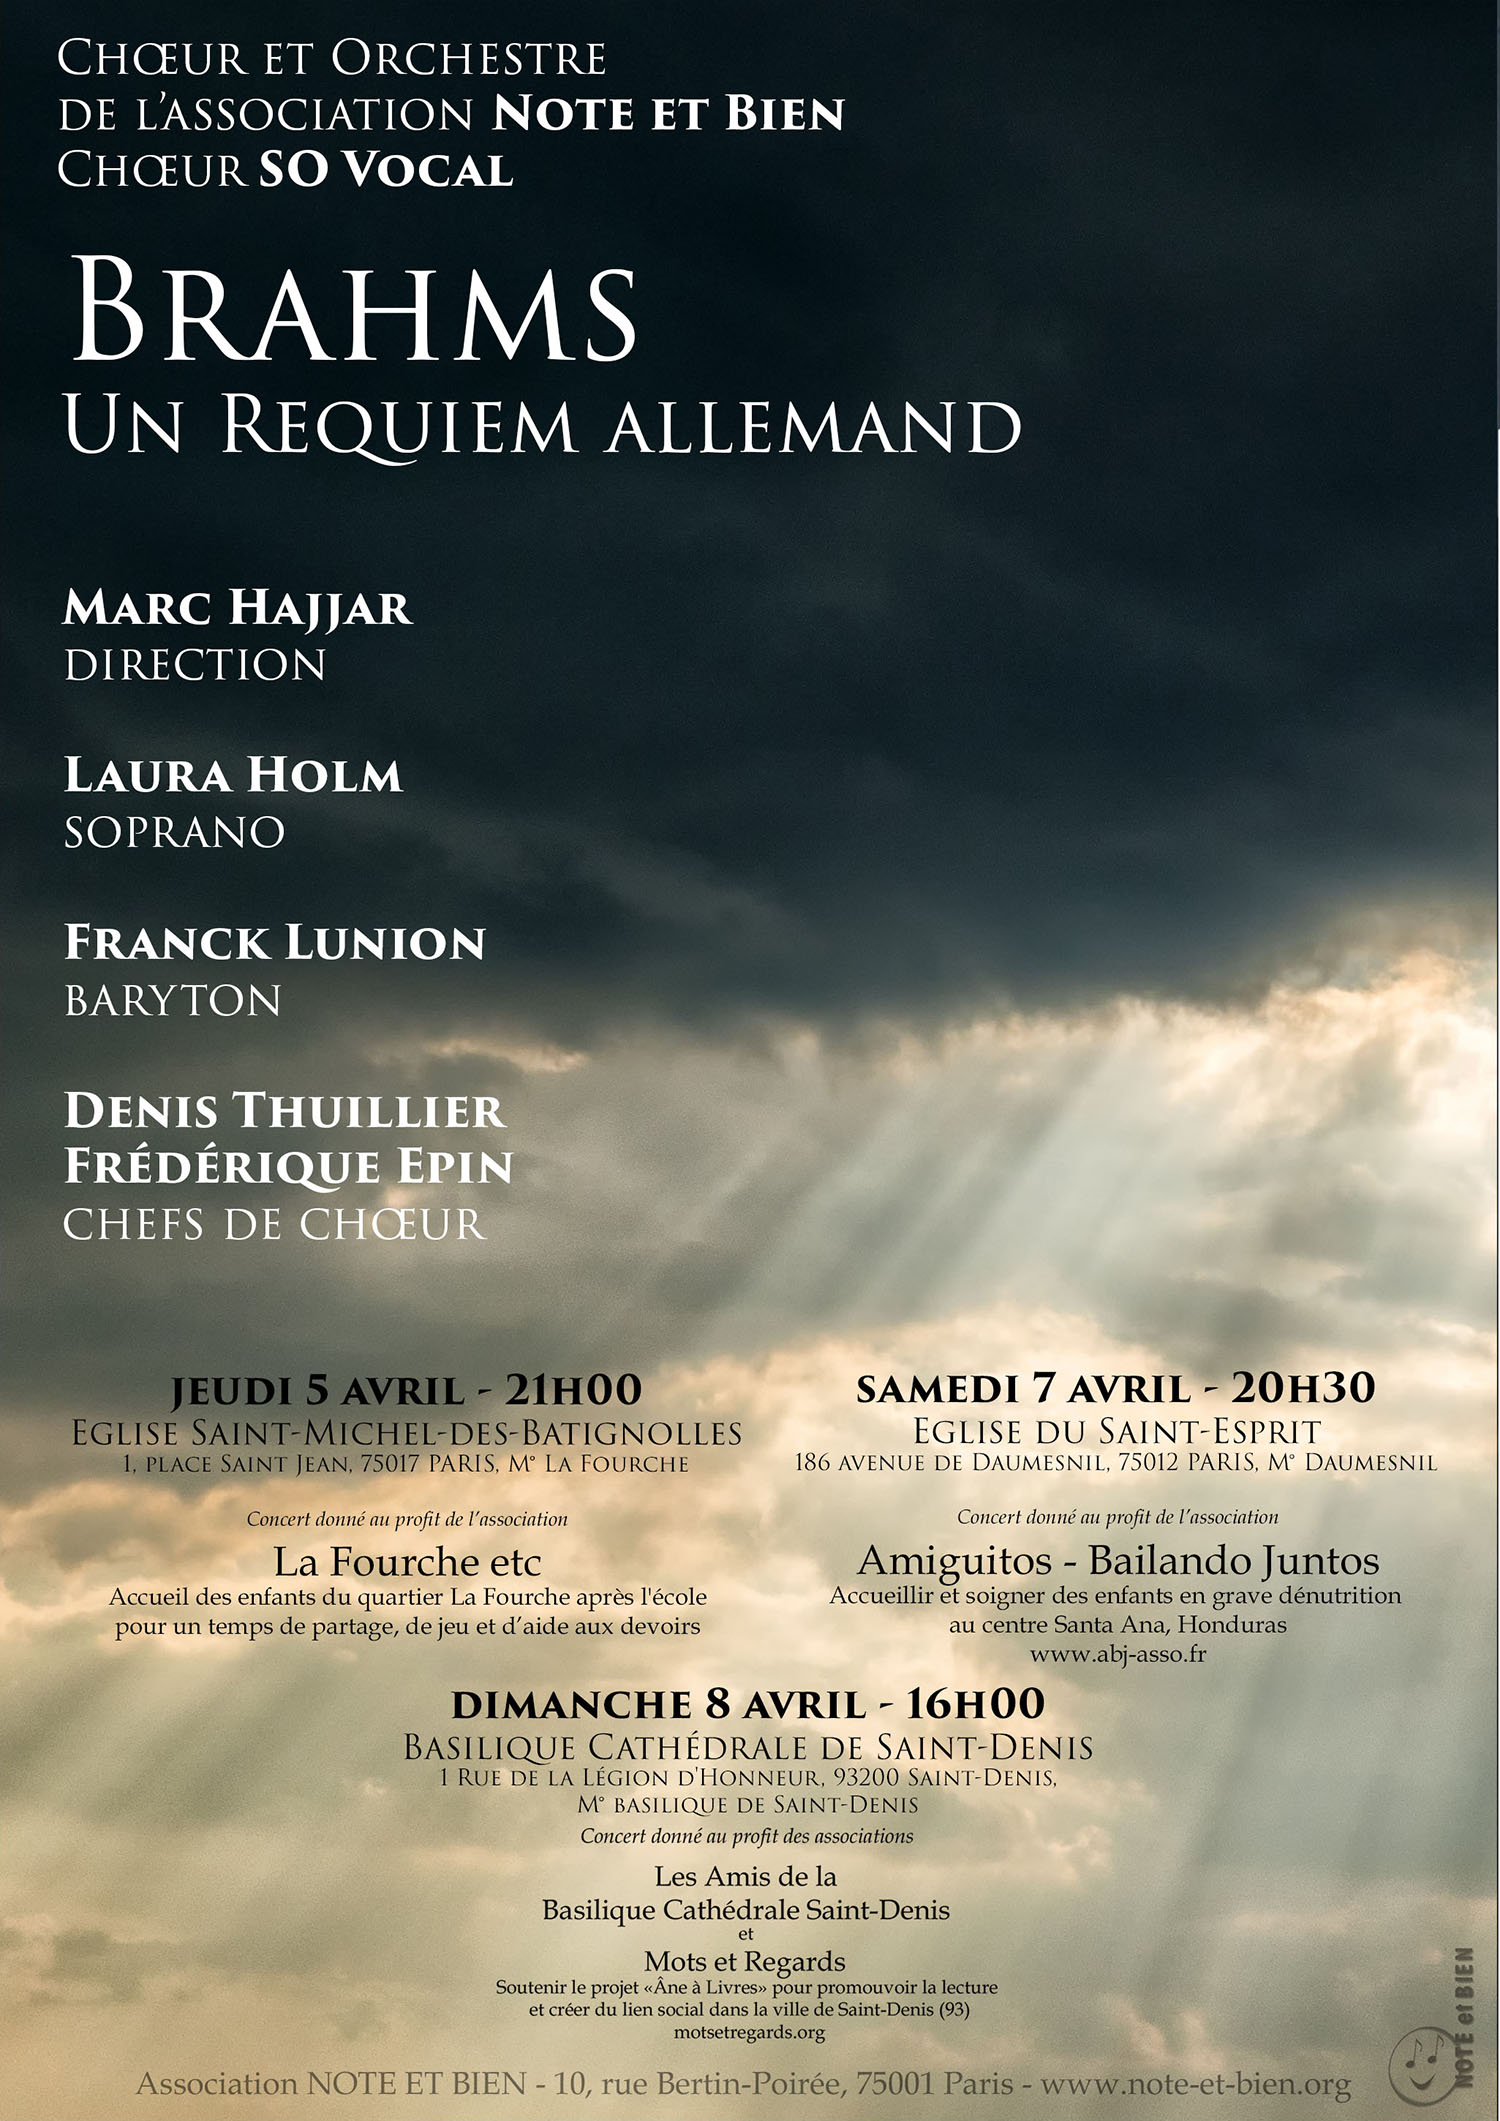 201804_Requiem_allemand